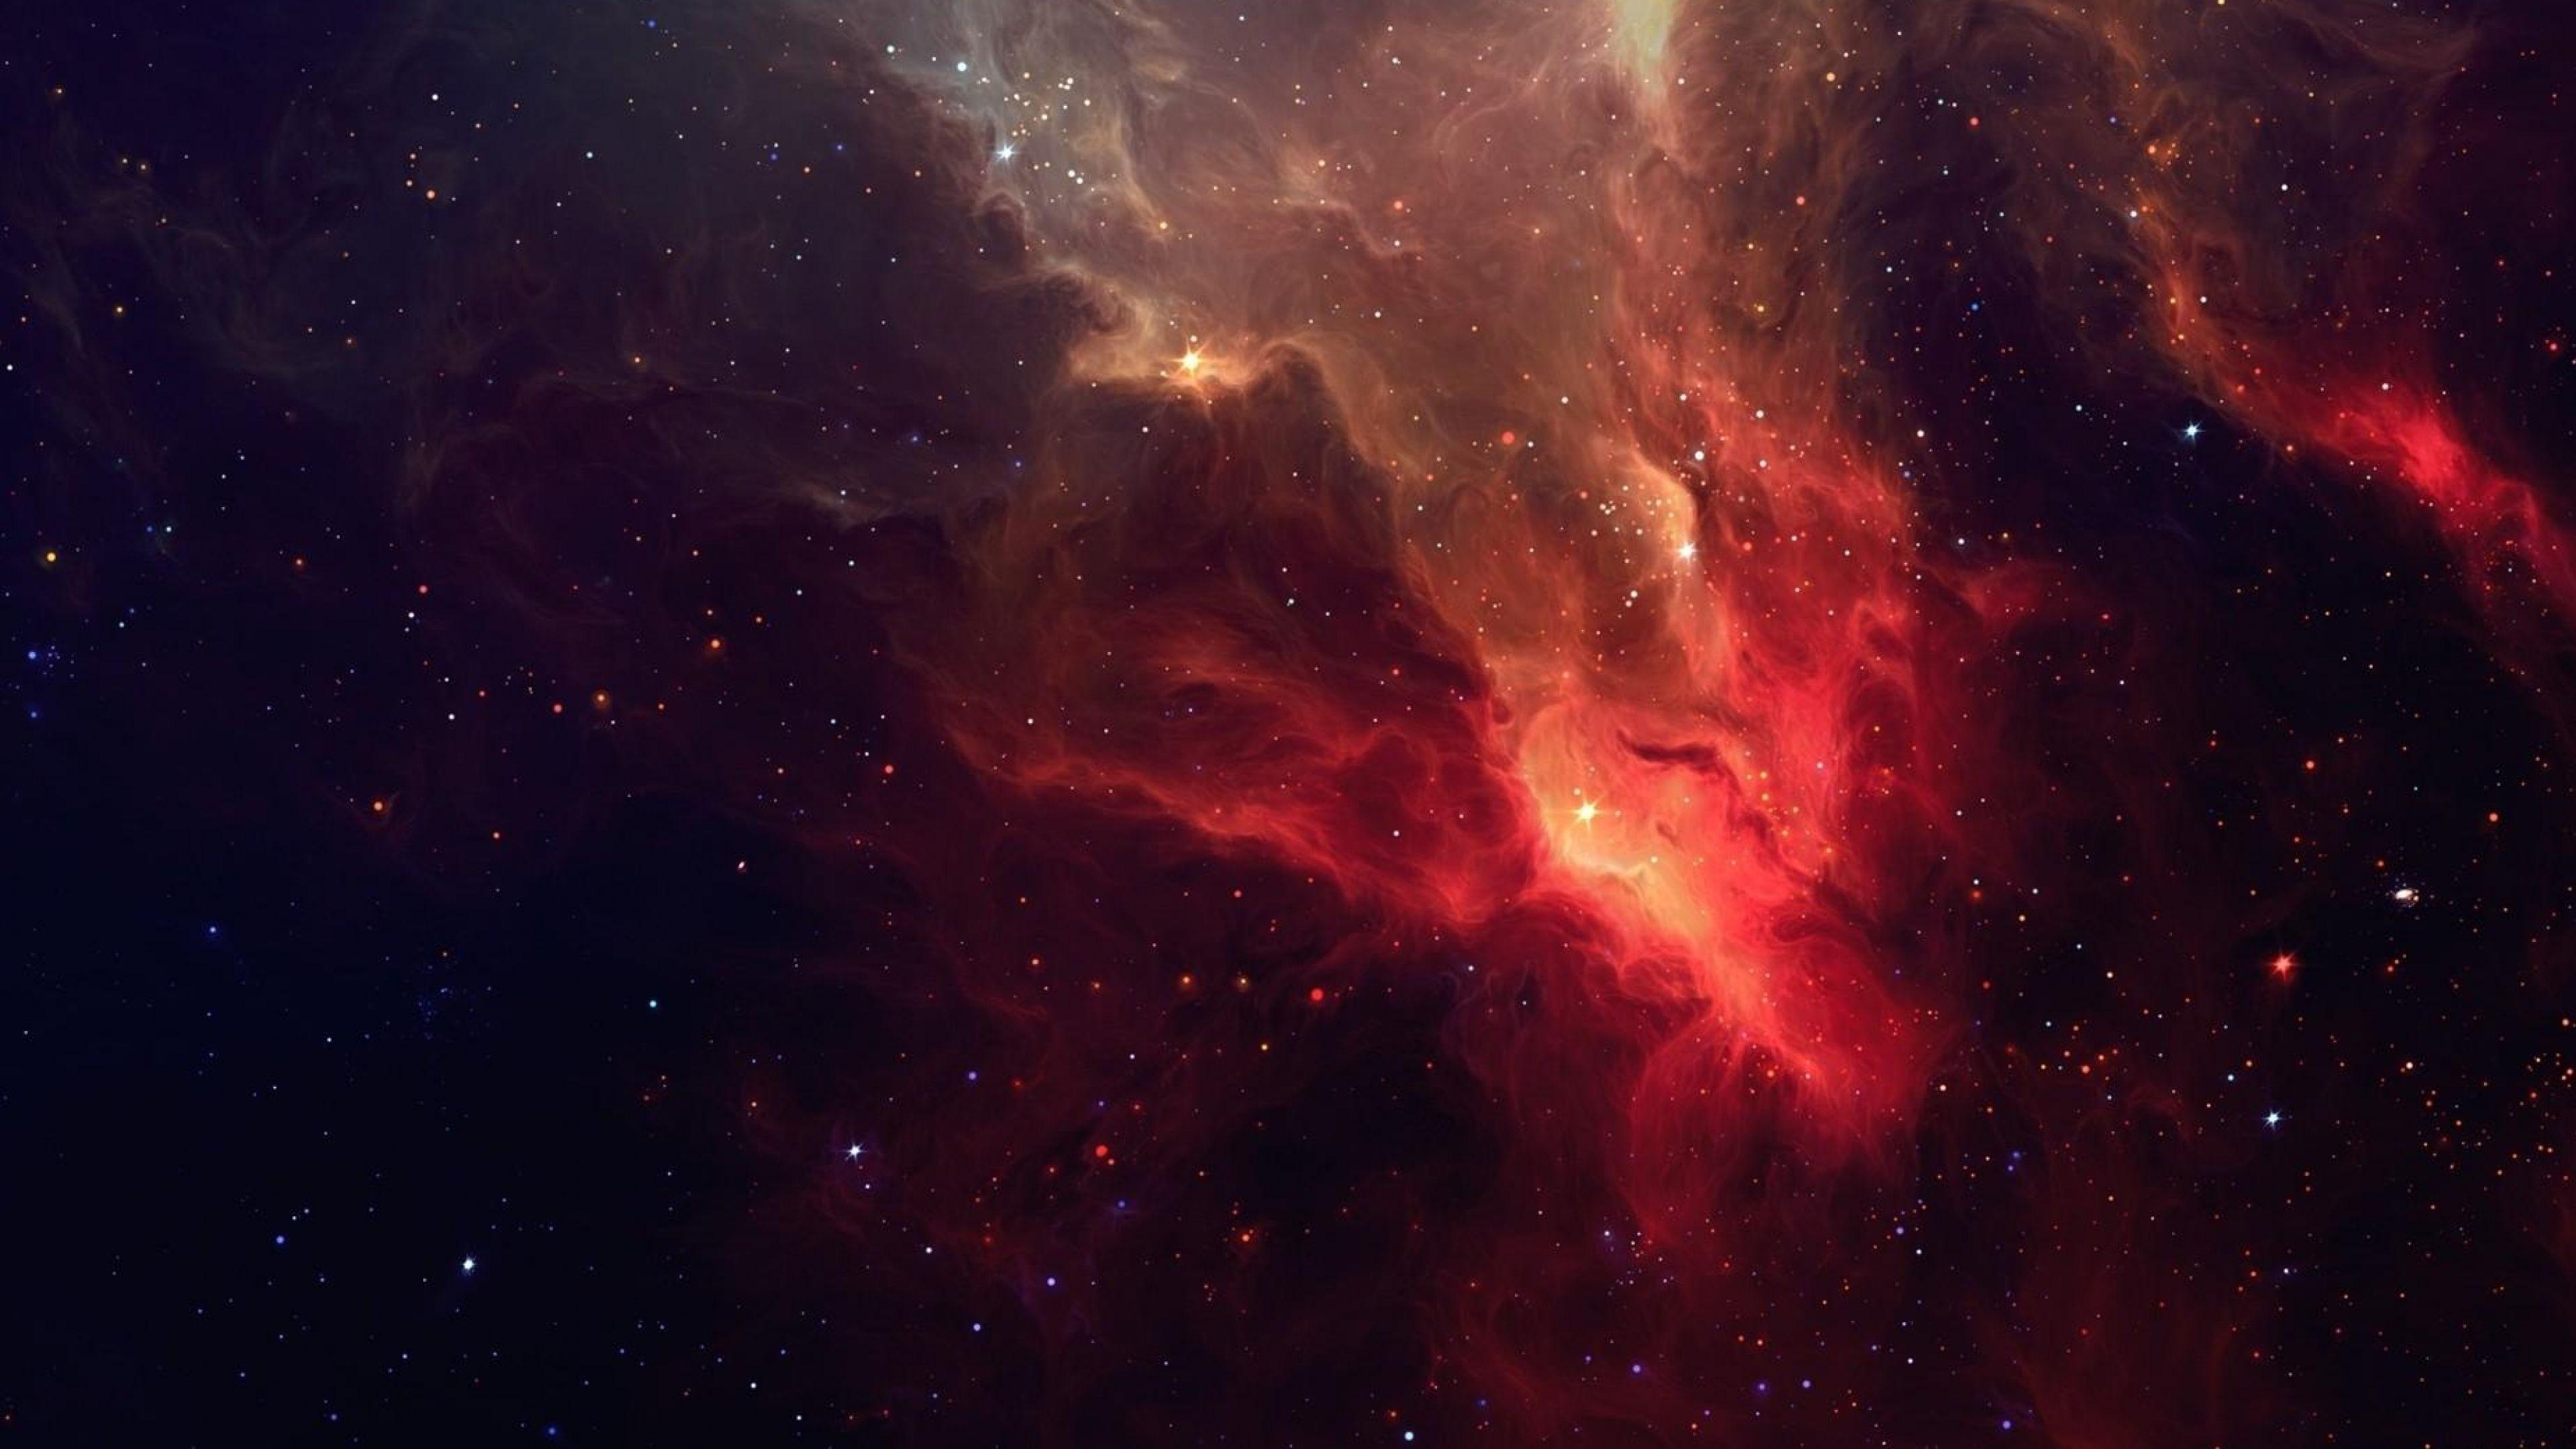 4k Ultra Hd Galaxy Wallpapers Top Free 4k Ultra Hd Galaxy Backgrounds Wallpaperaccess Nebula Wallpaper Wallpaper Space Chill Wallpaper